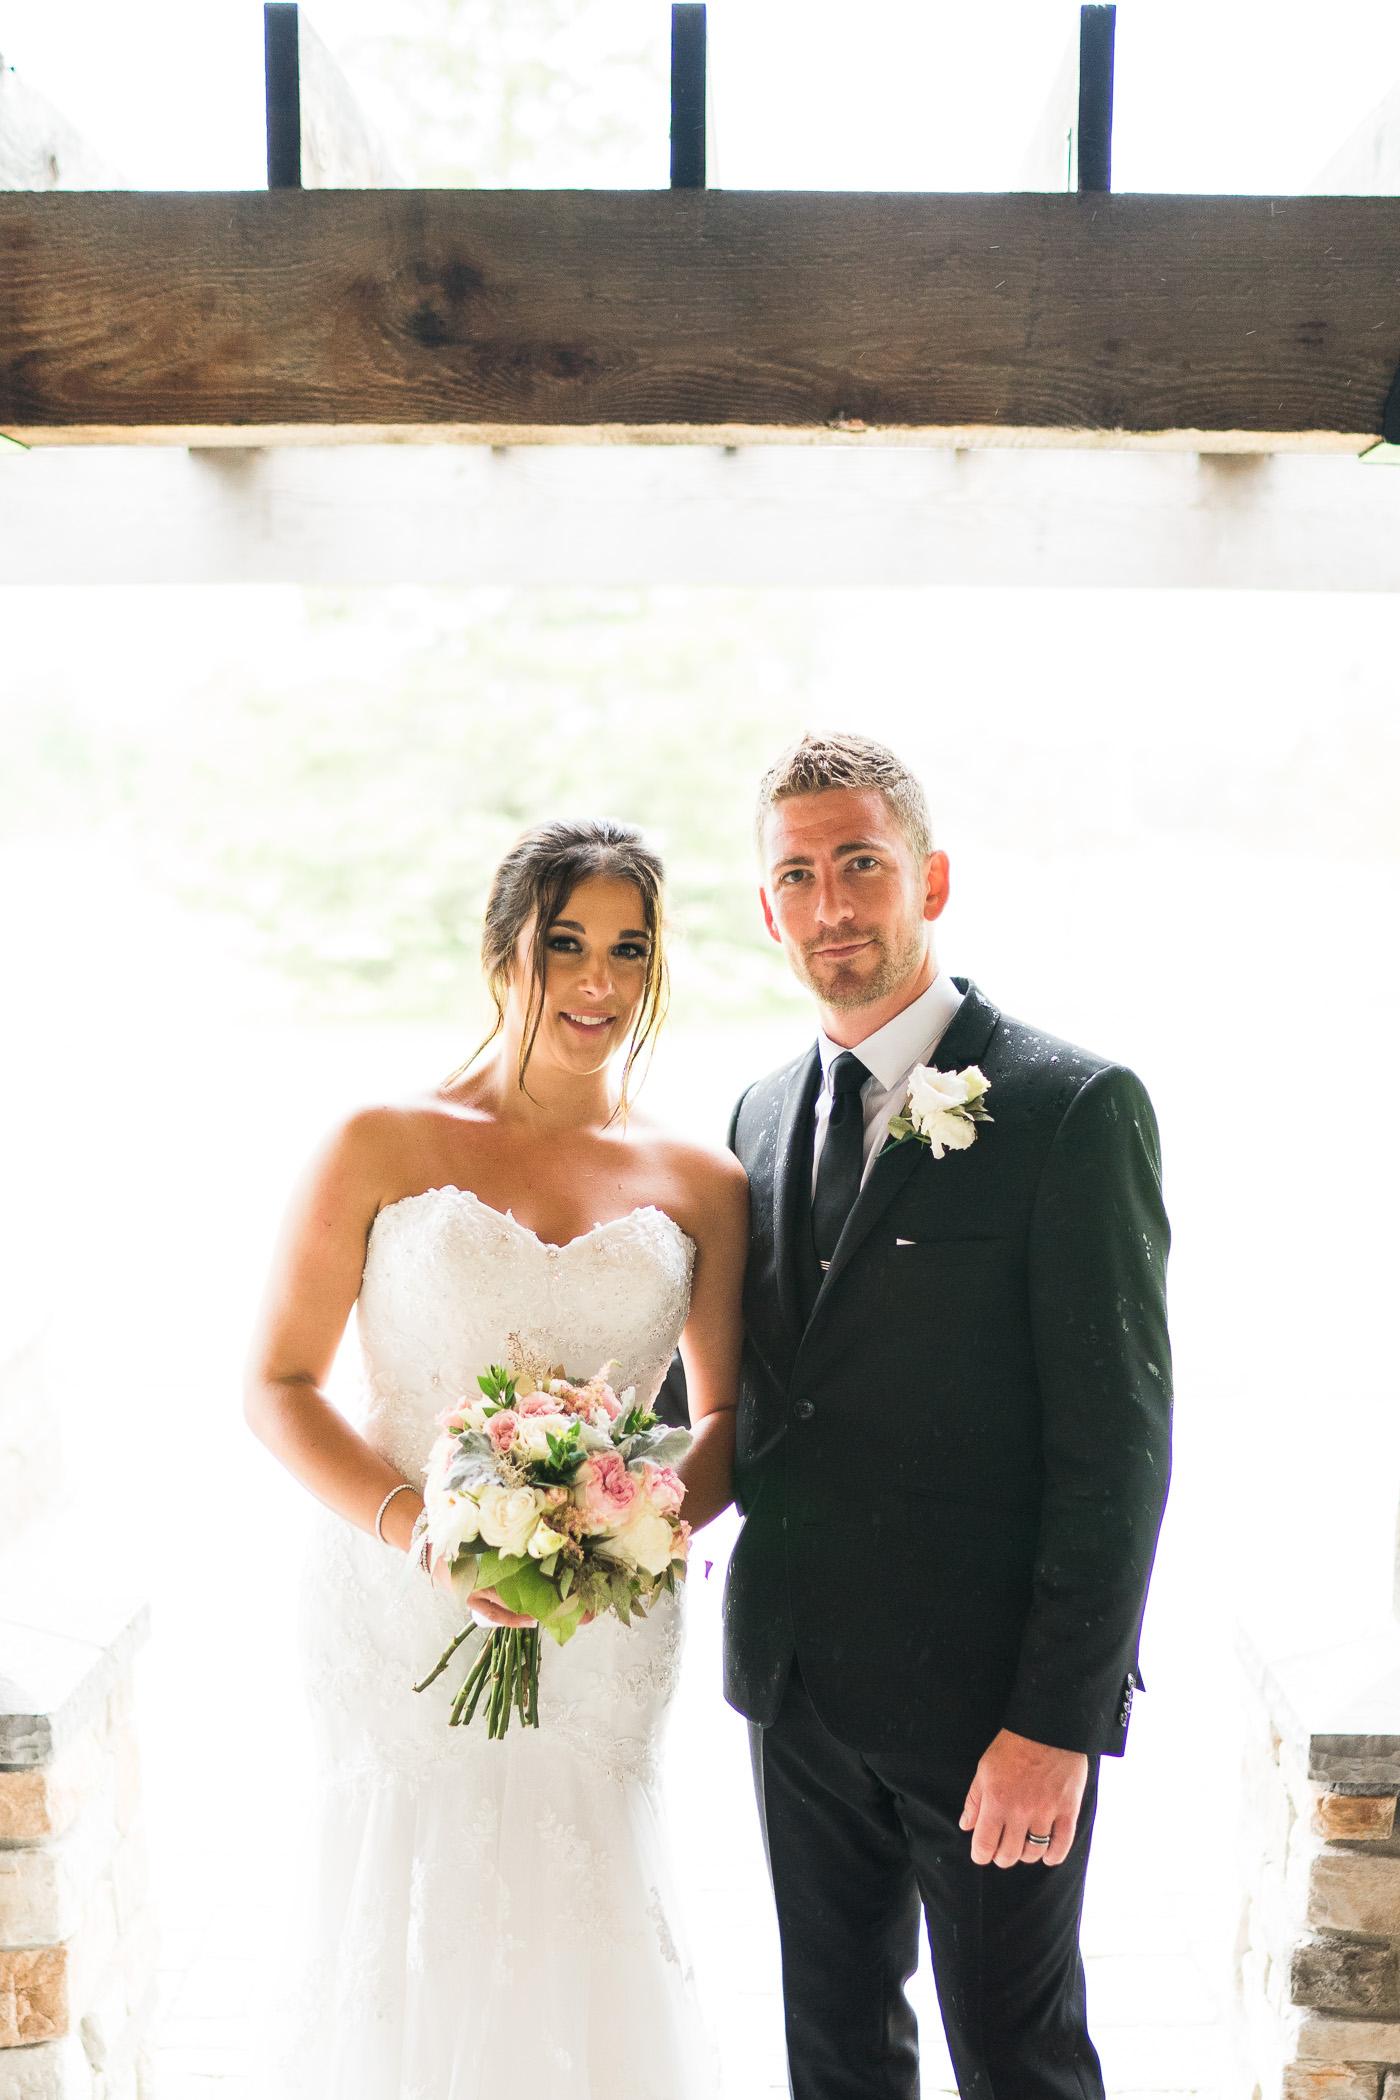 Marie and Steve - Breezy Bend Wedding - Cojo Photo-1156.jpg